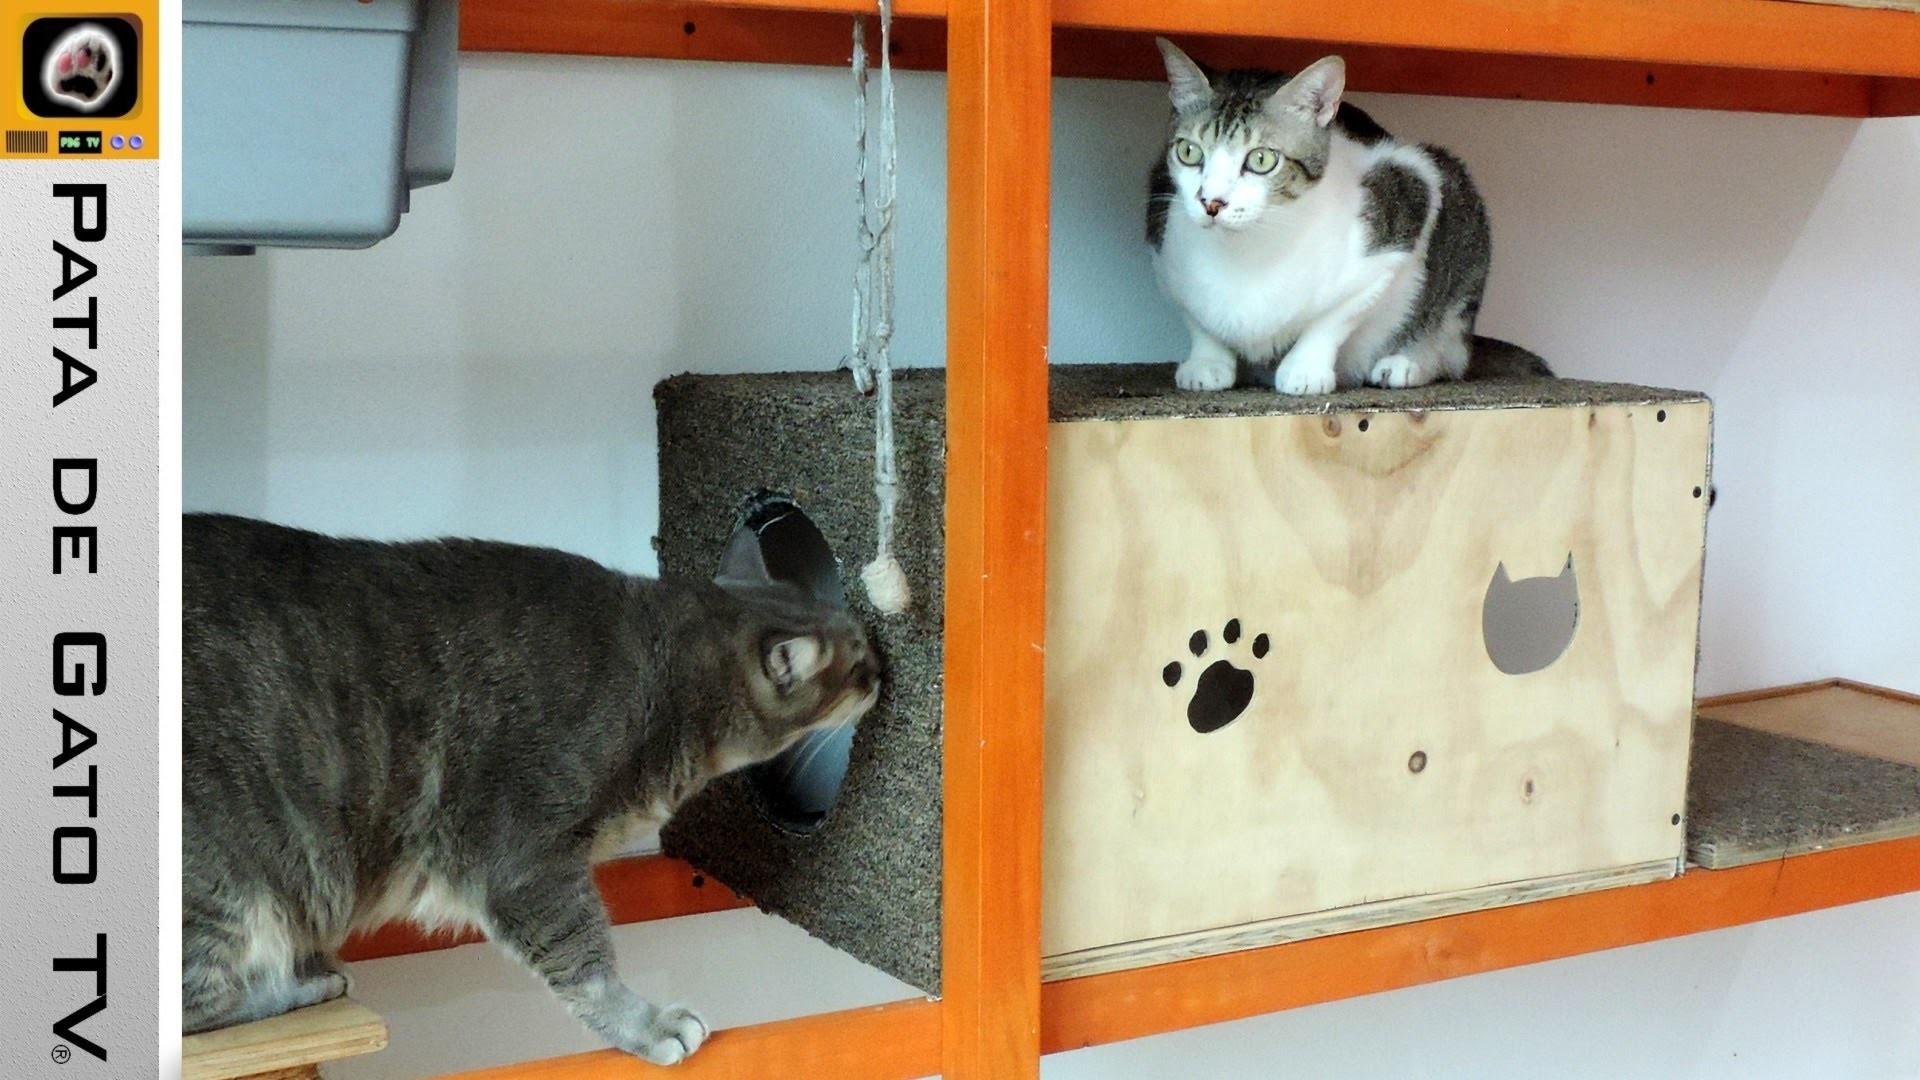 Caja de juegos para gatitos. Playground box for cats.